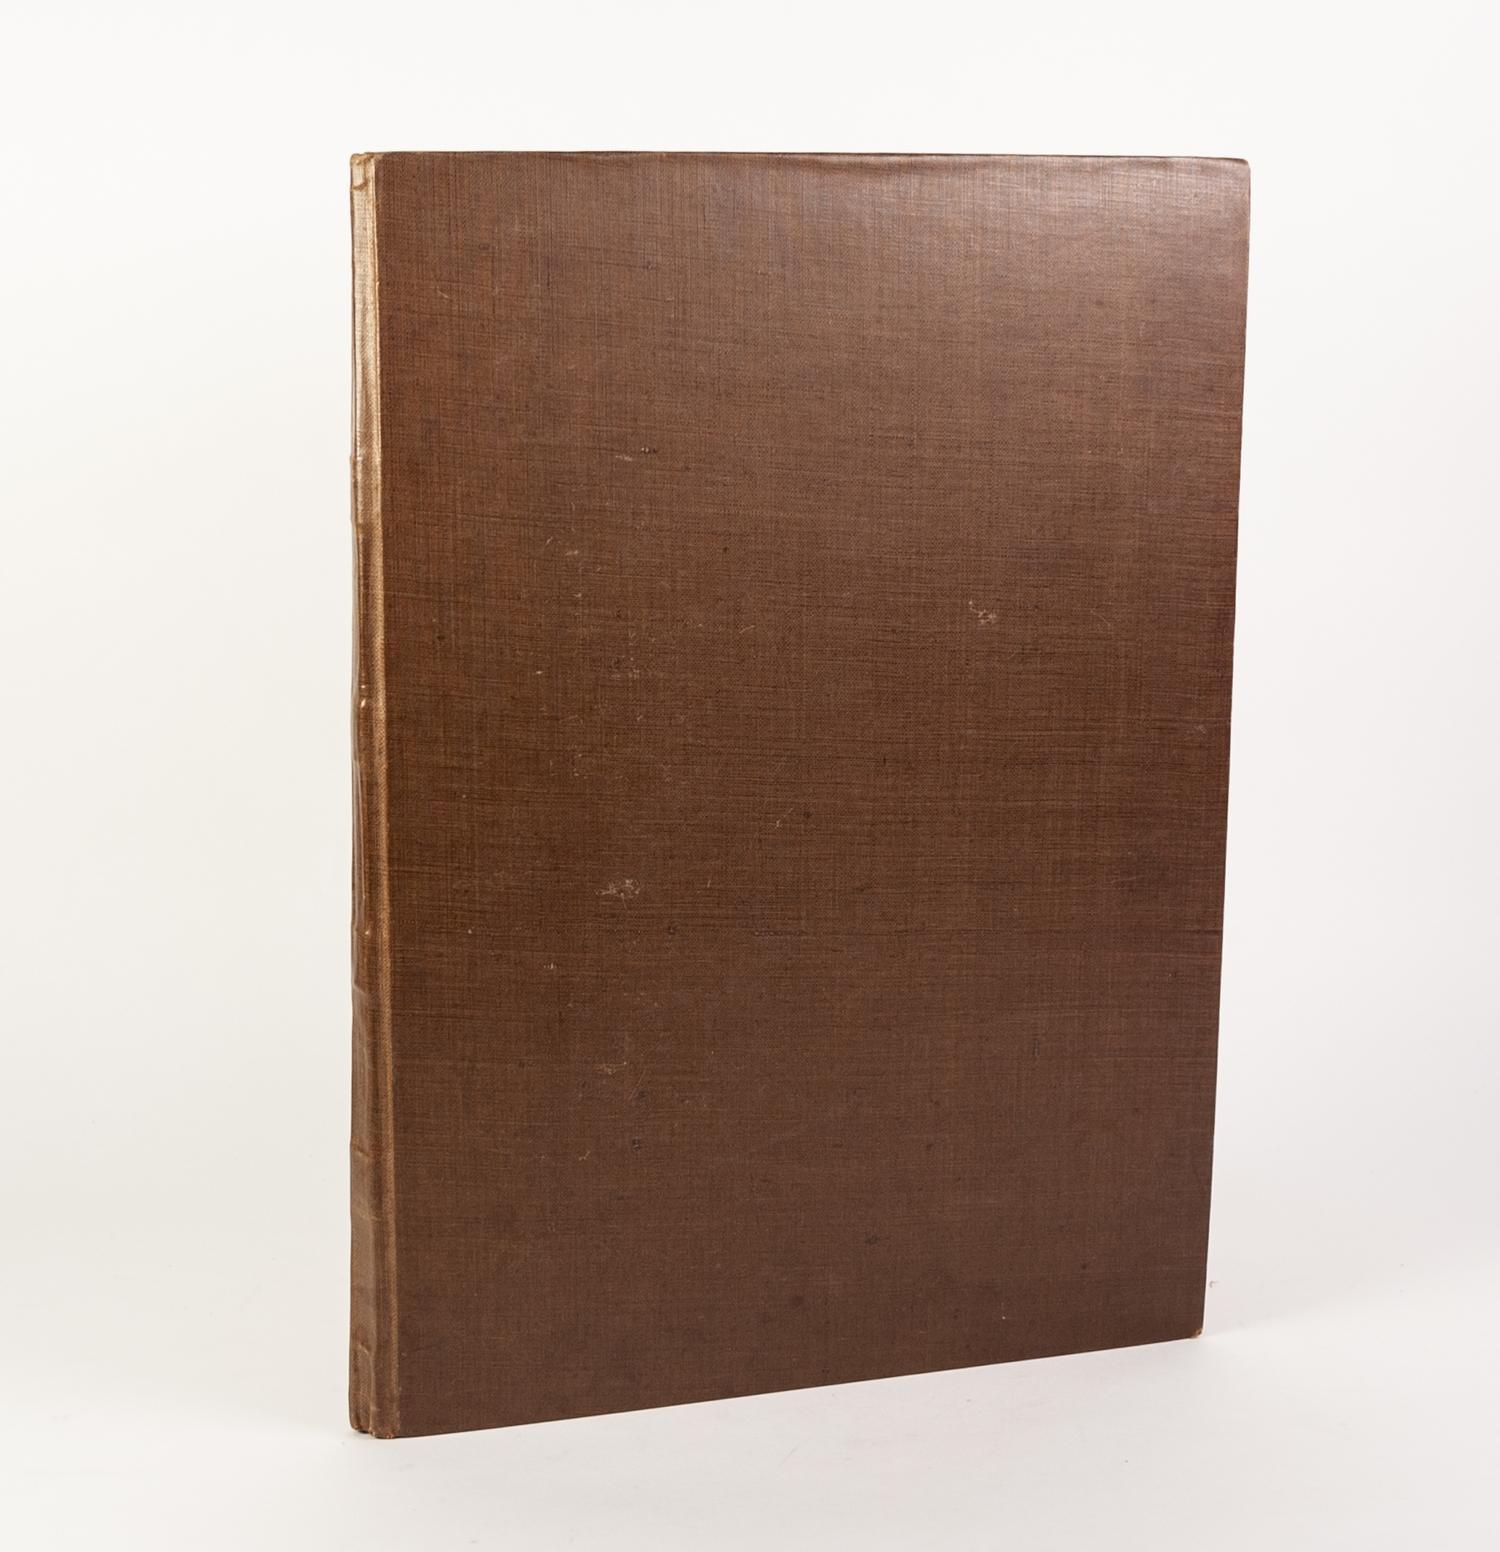 Lot 45 - JOHN HEYWOODS NEW MAP OF GREATER MANCHESTER 1884 - 85, six sheets, large folio, buckram binding